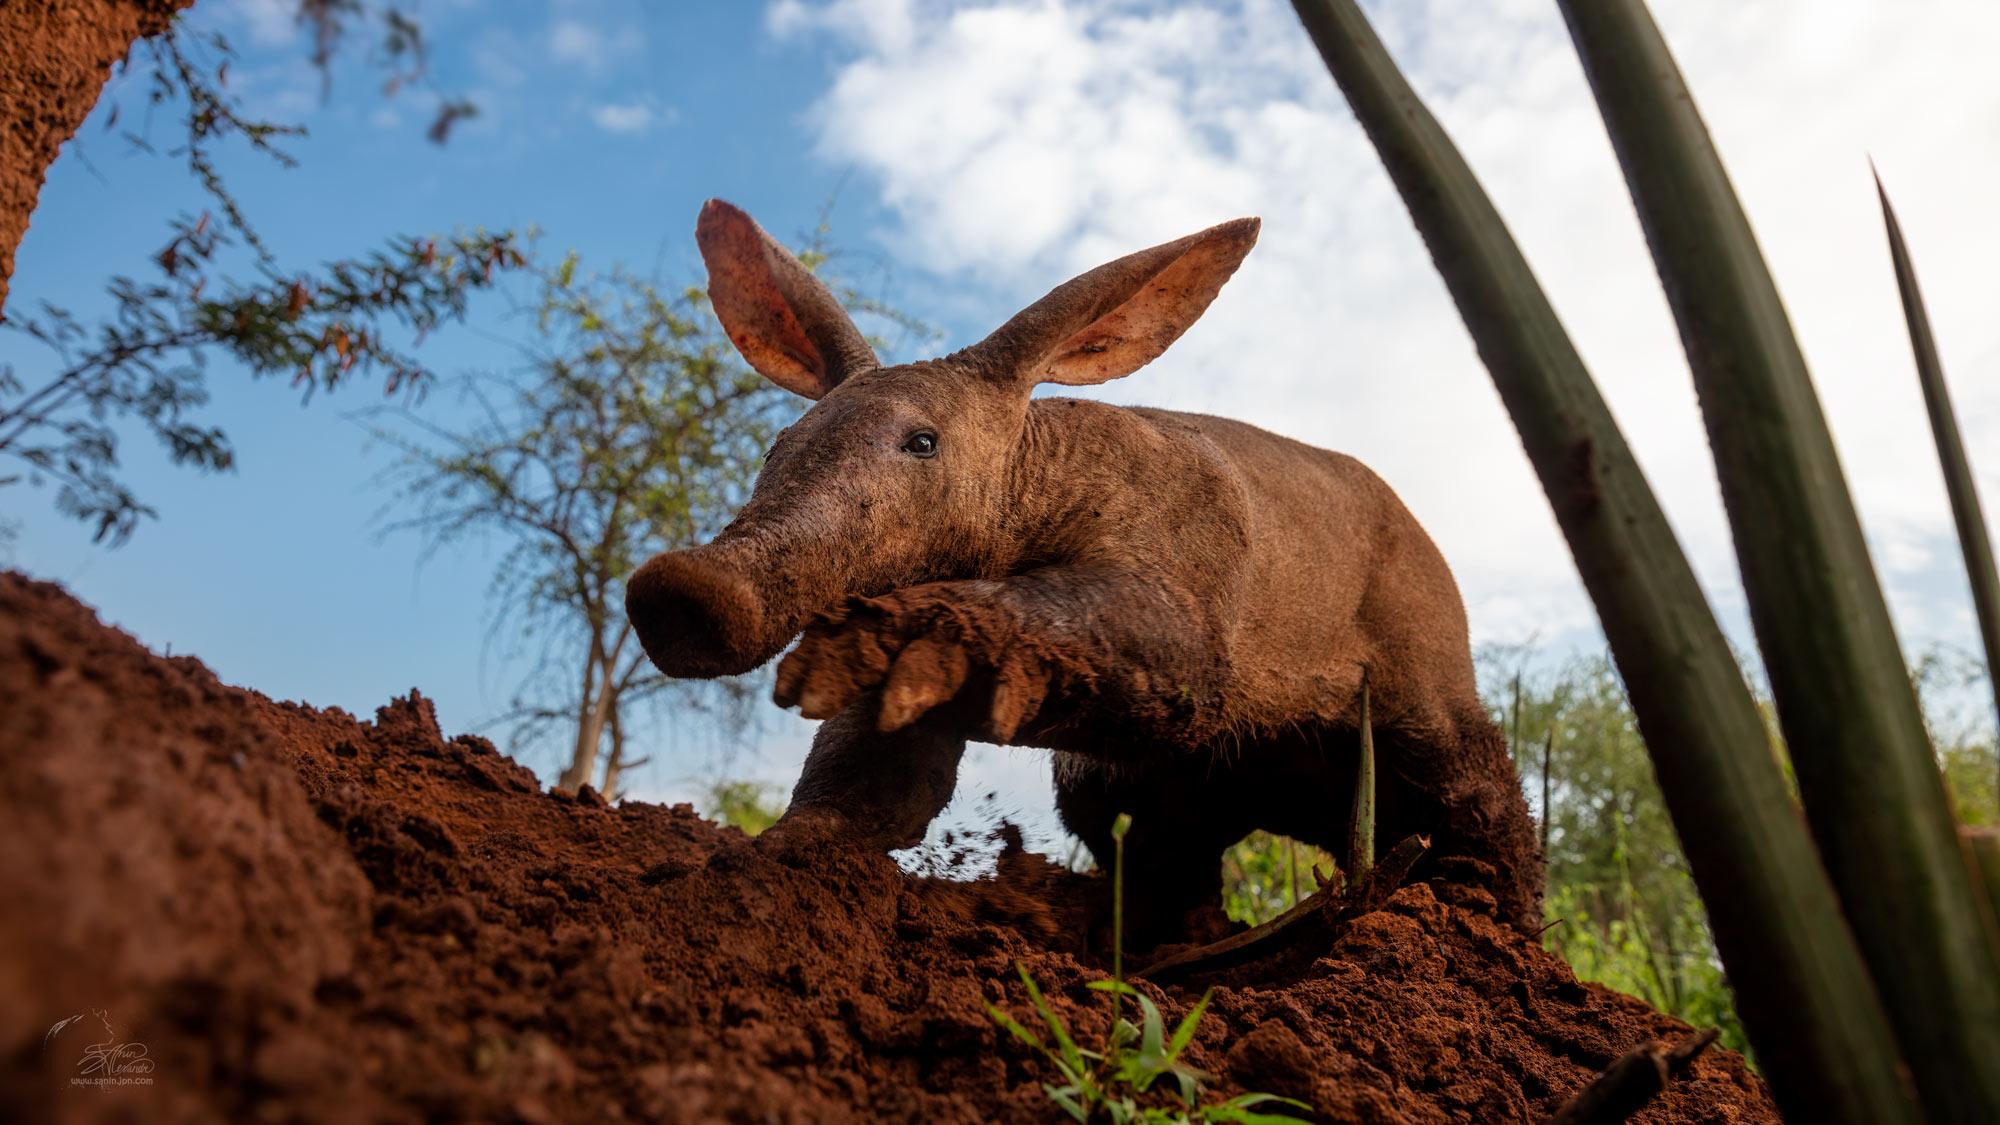 Aardvark digging termite mound